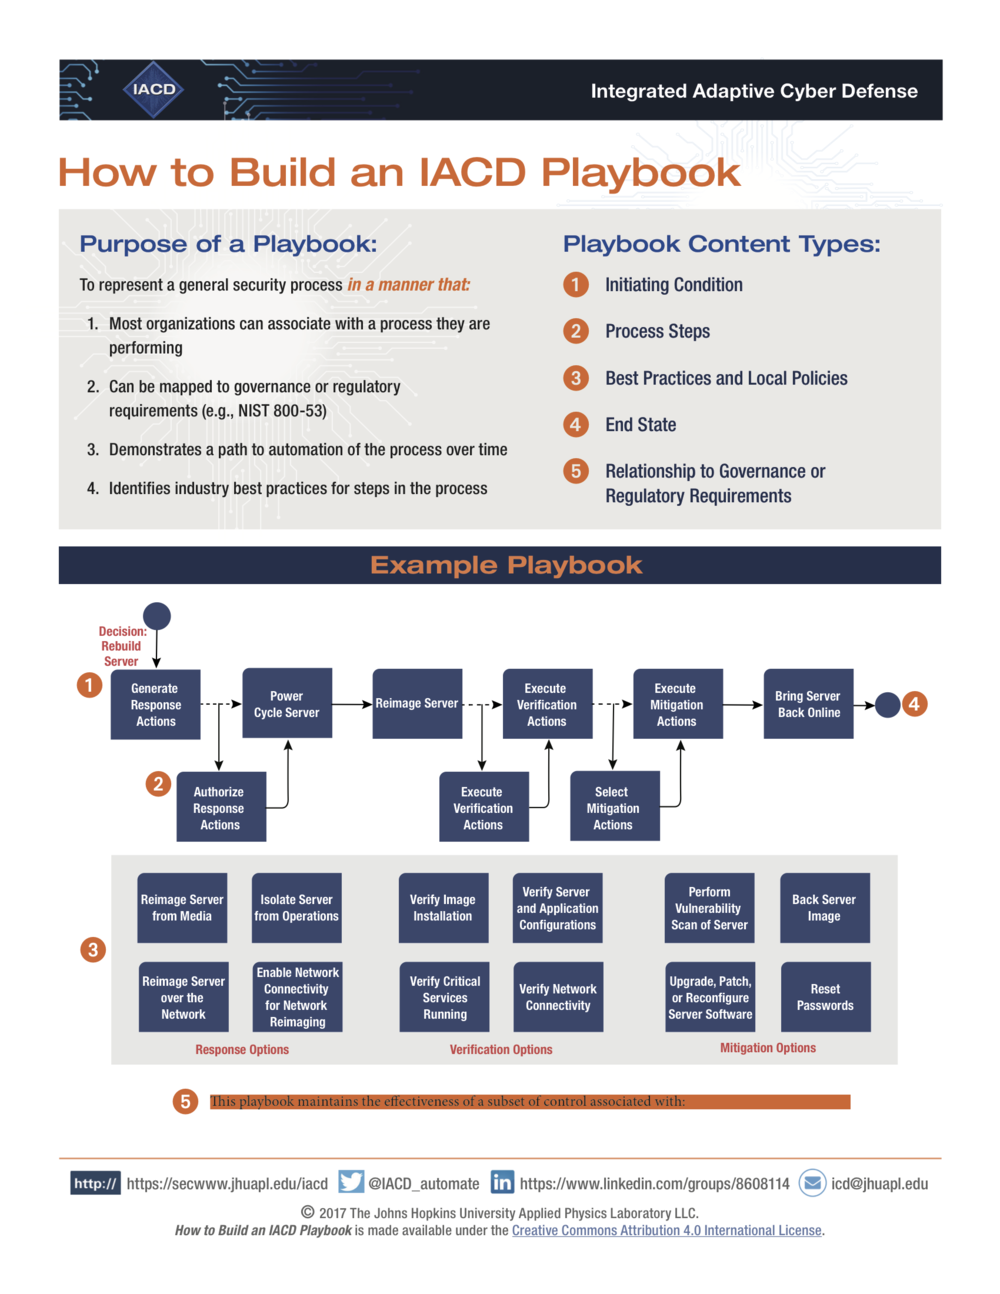 How to build an IACD Playbok